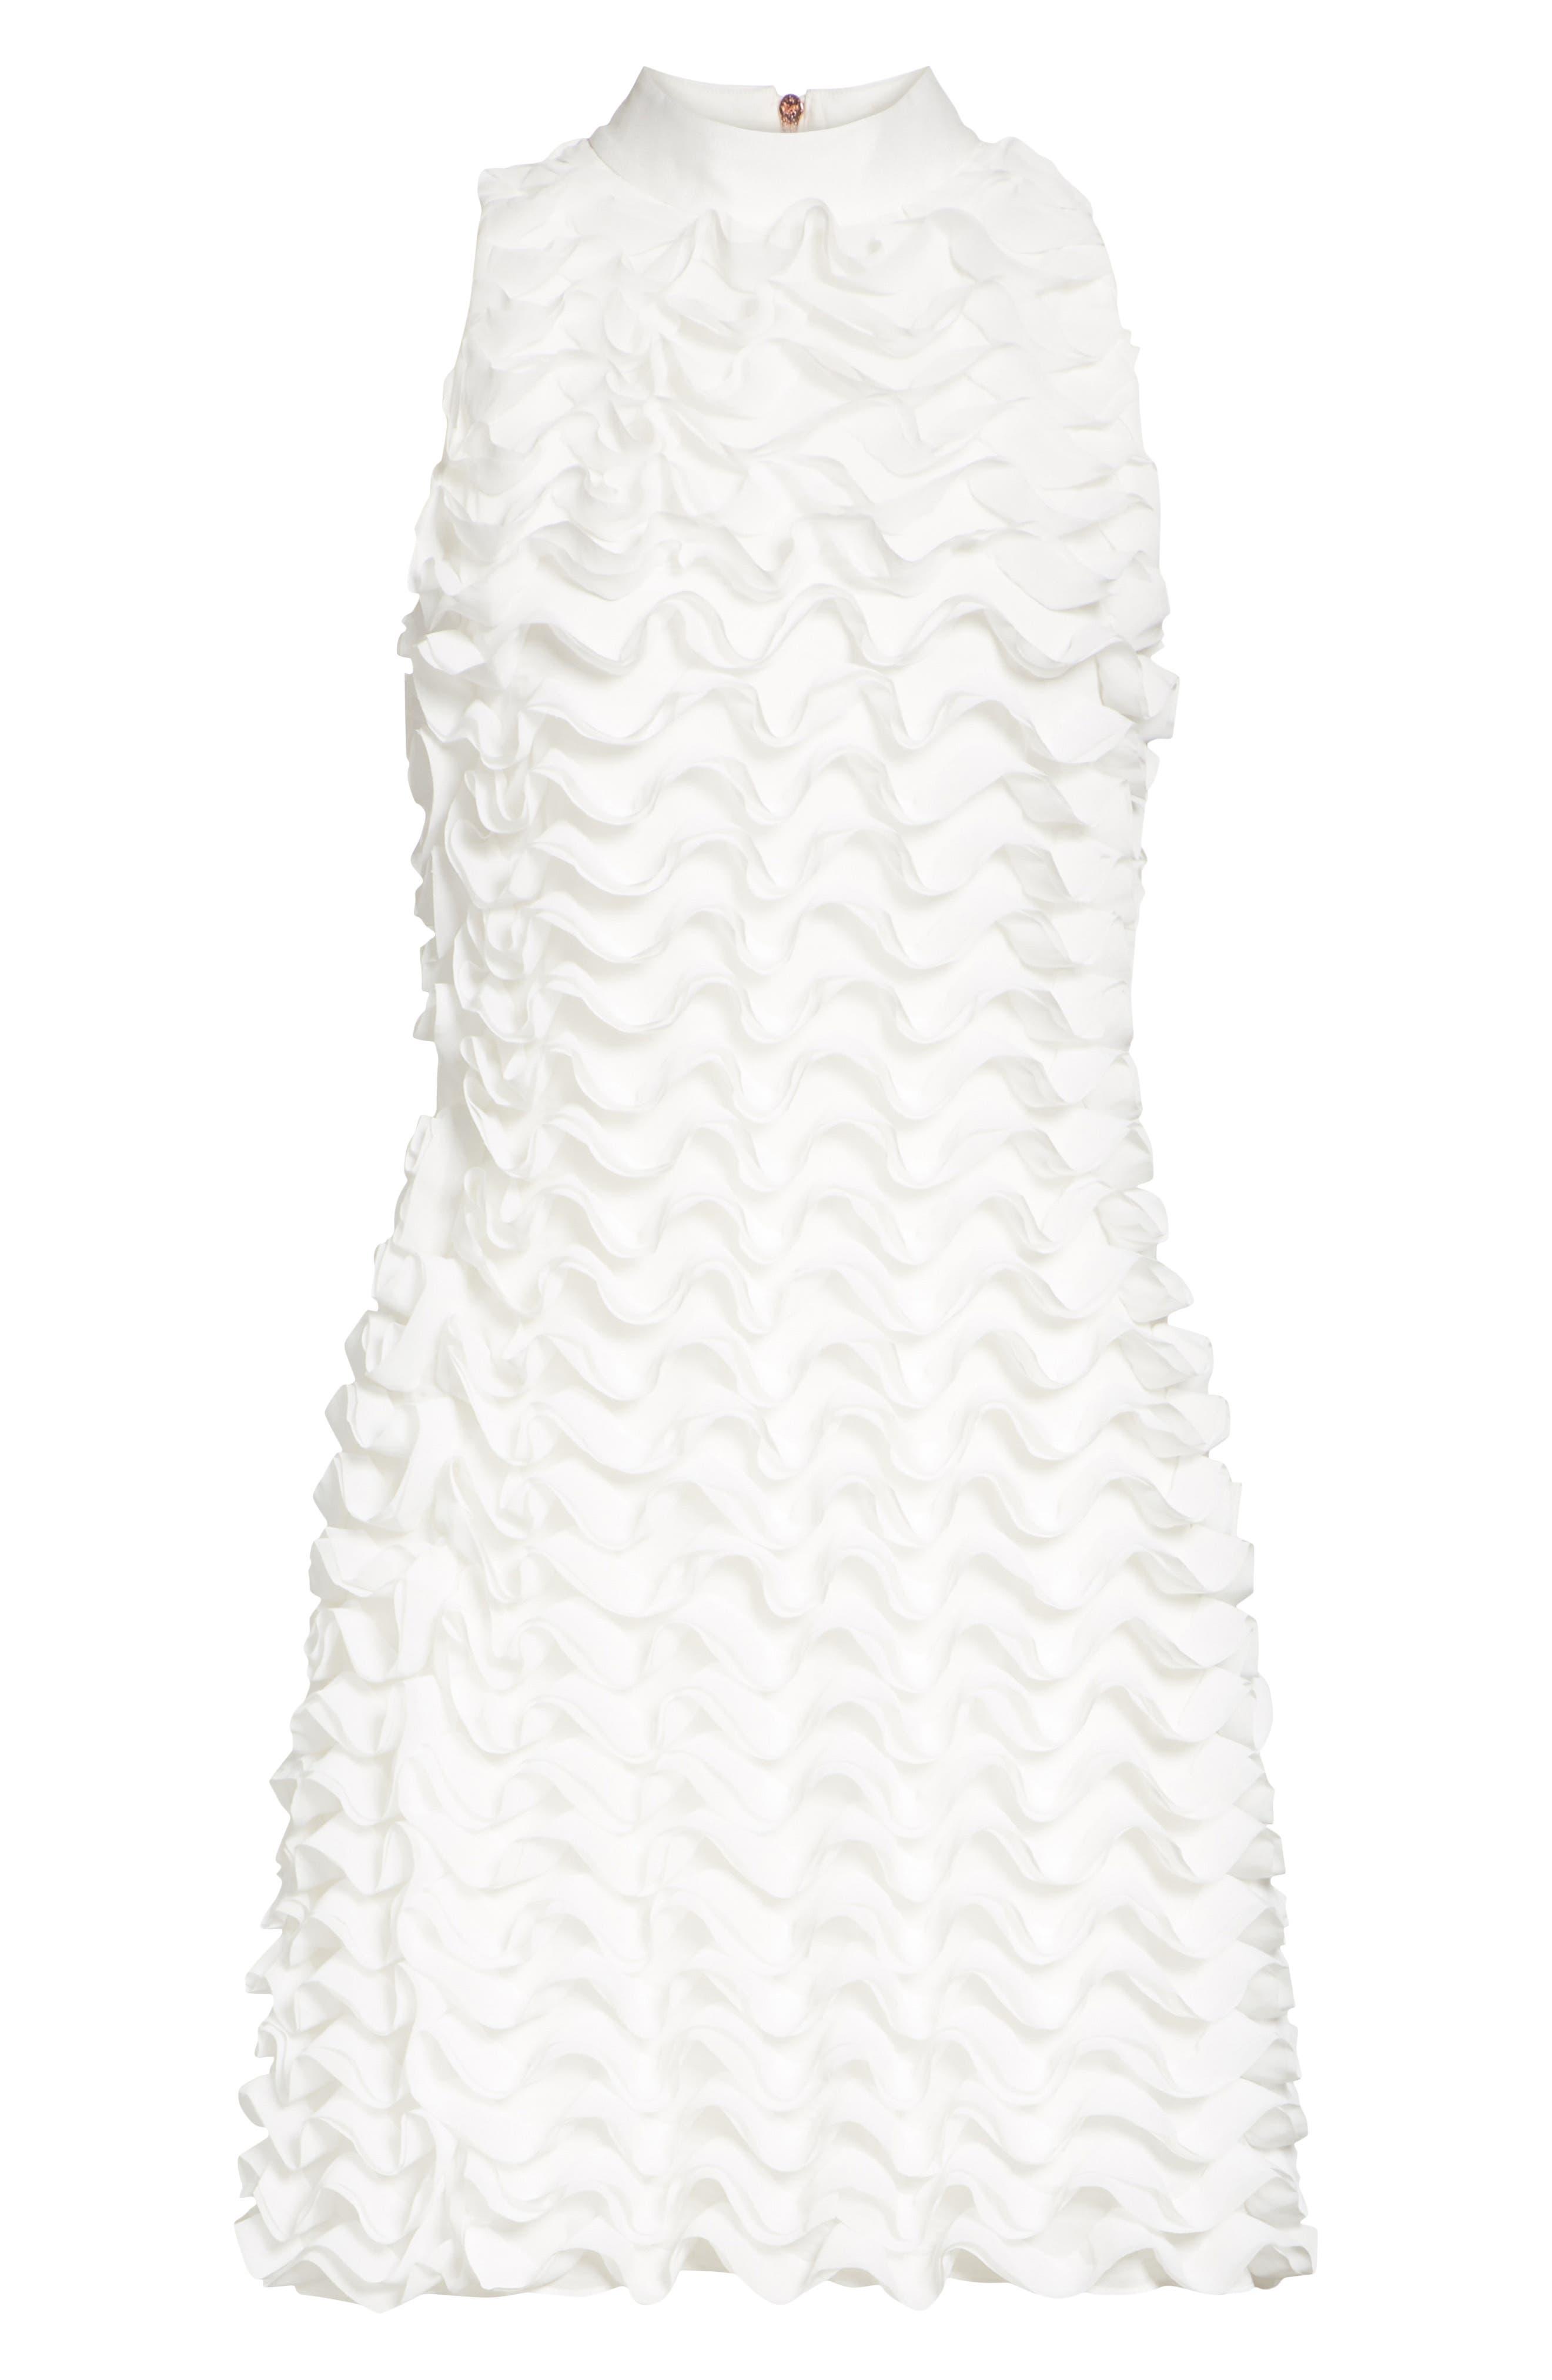 Ruffled Tunic Dress,                             Alternate thumbnail 6, color,                             110